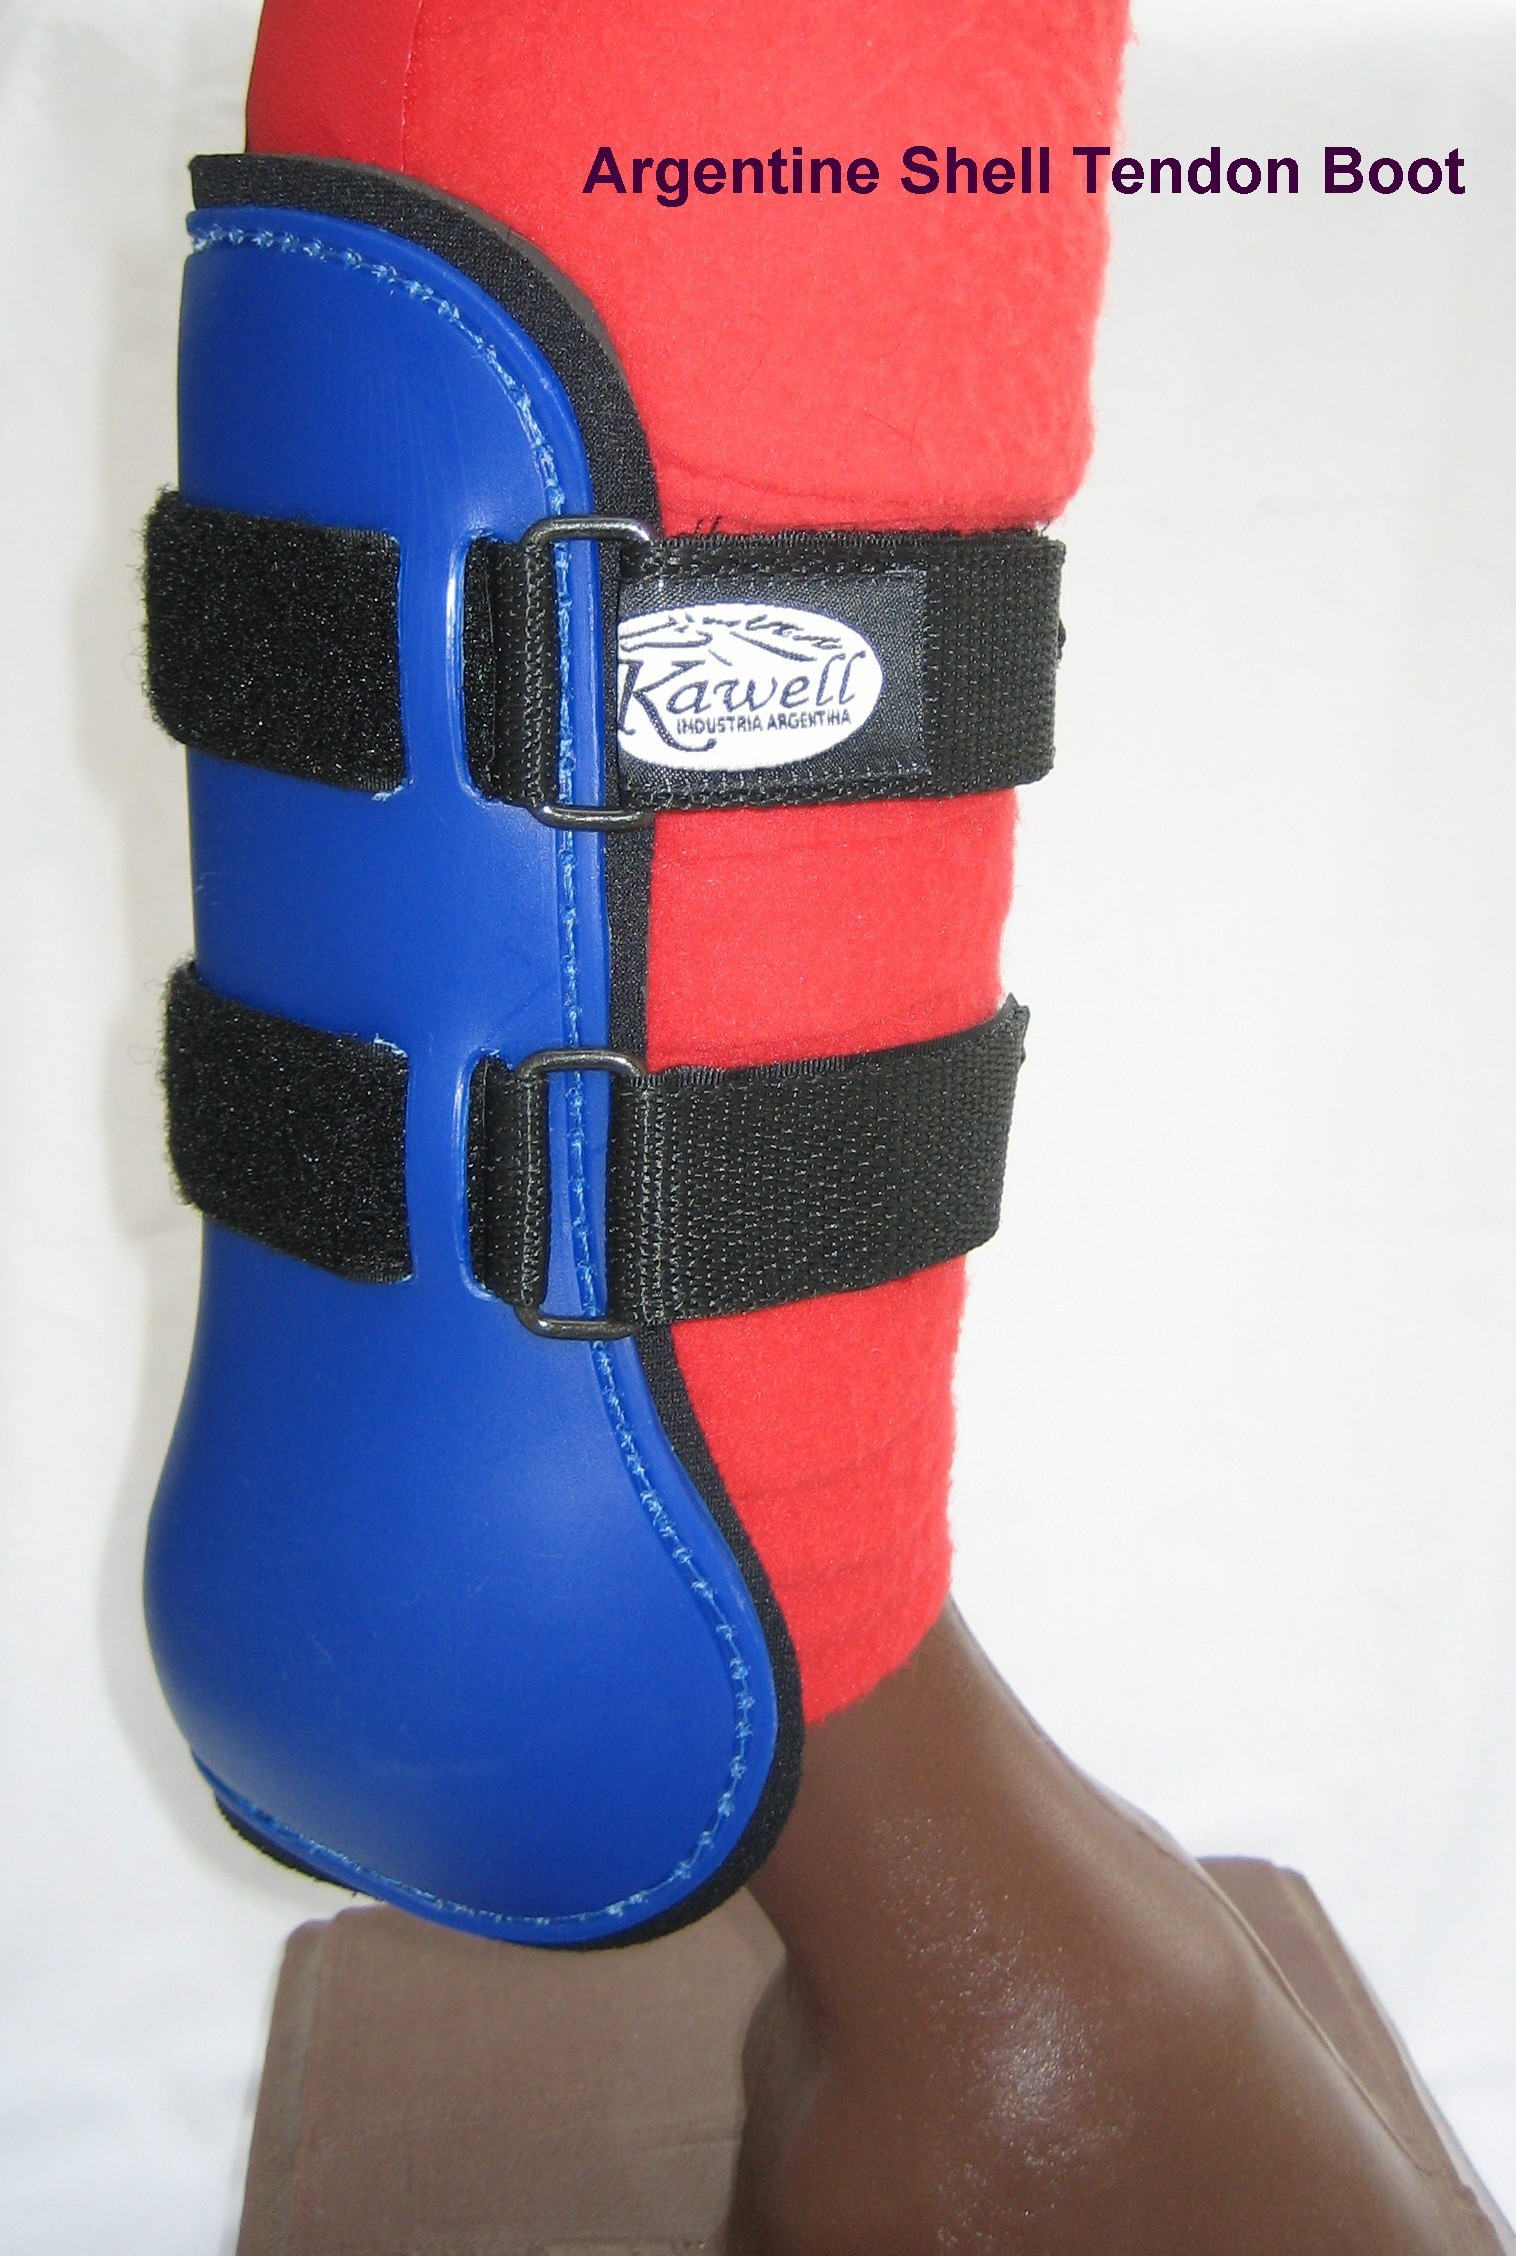 Shell Tendon Boots